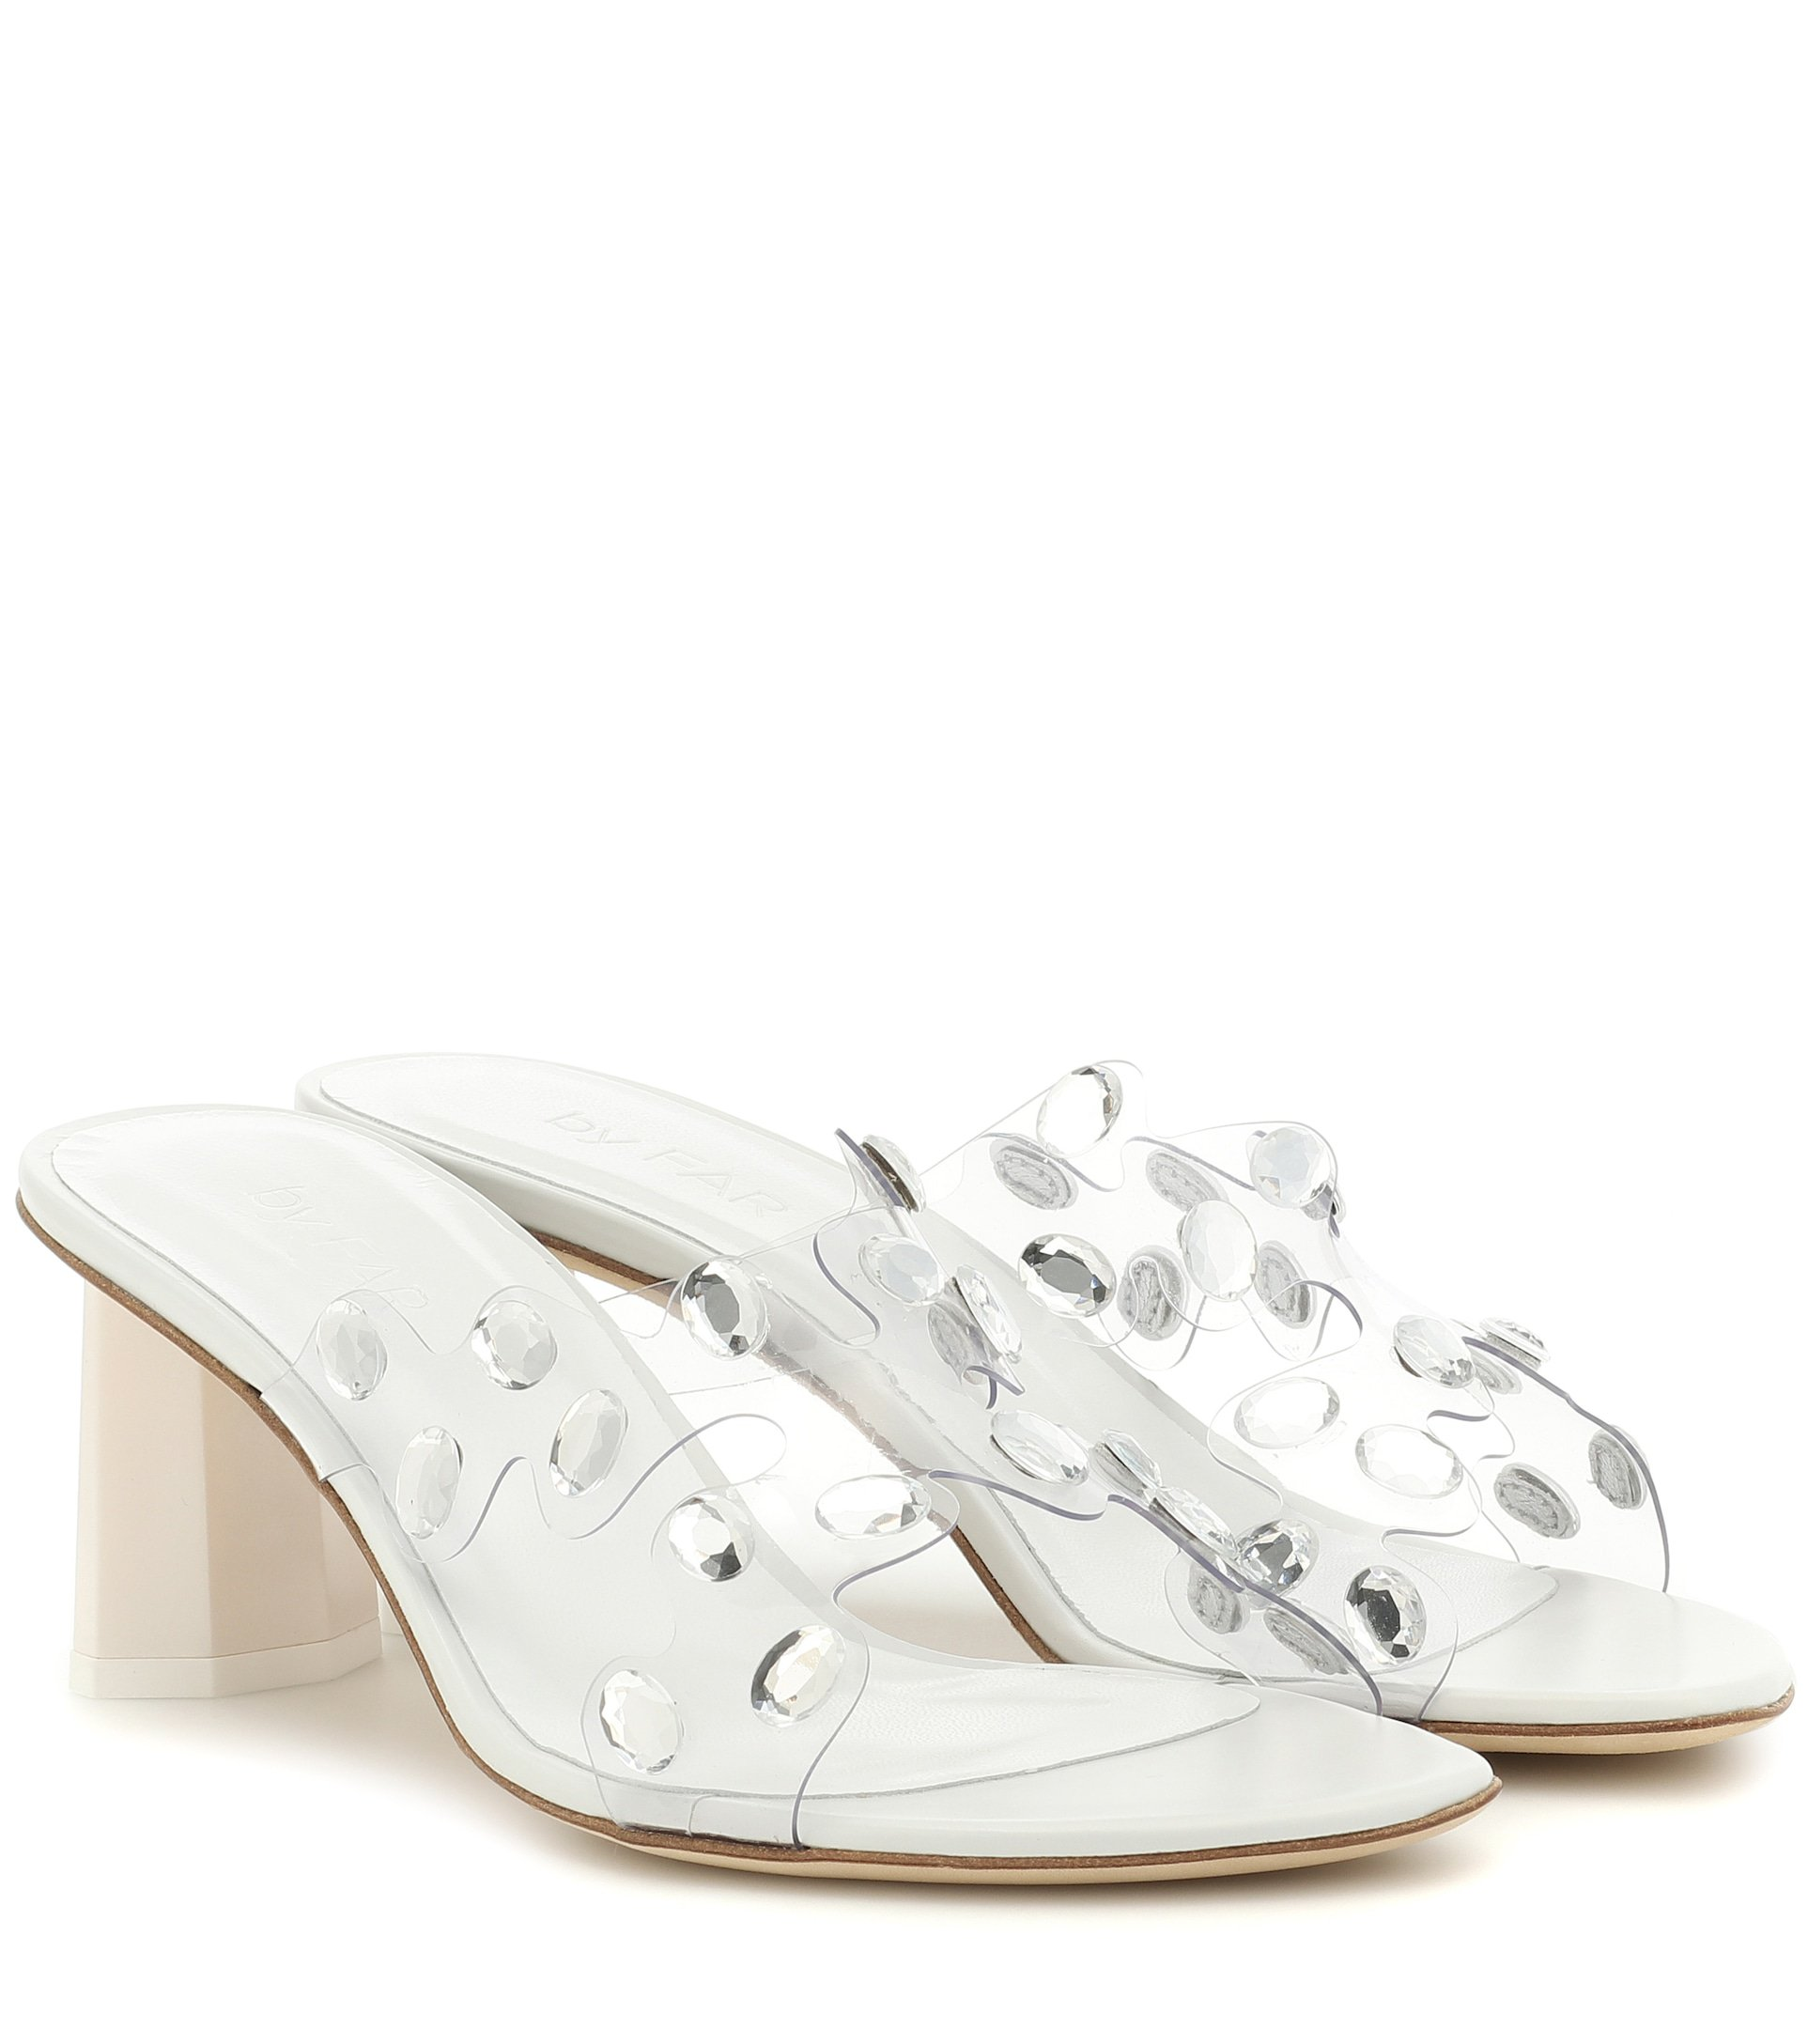 Gorgeous Embellished Pvc Sandals - By Far | Mytheresa